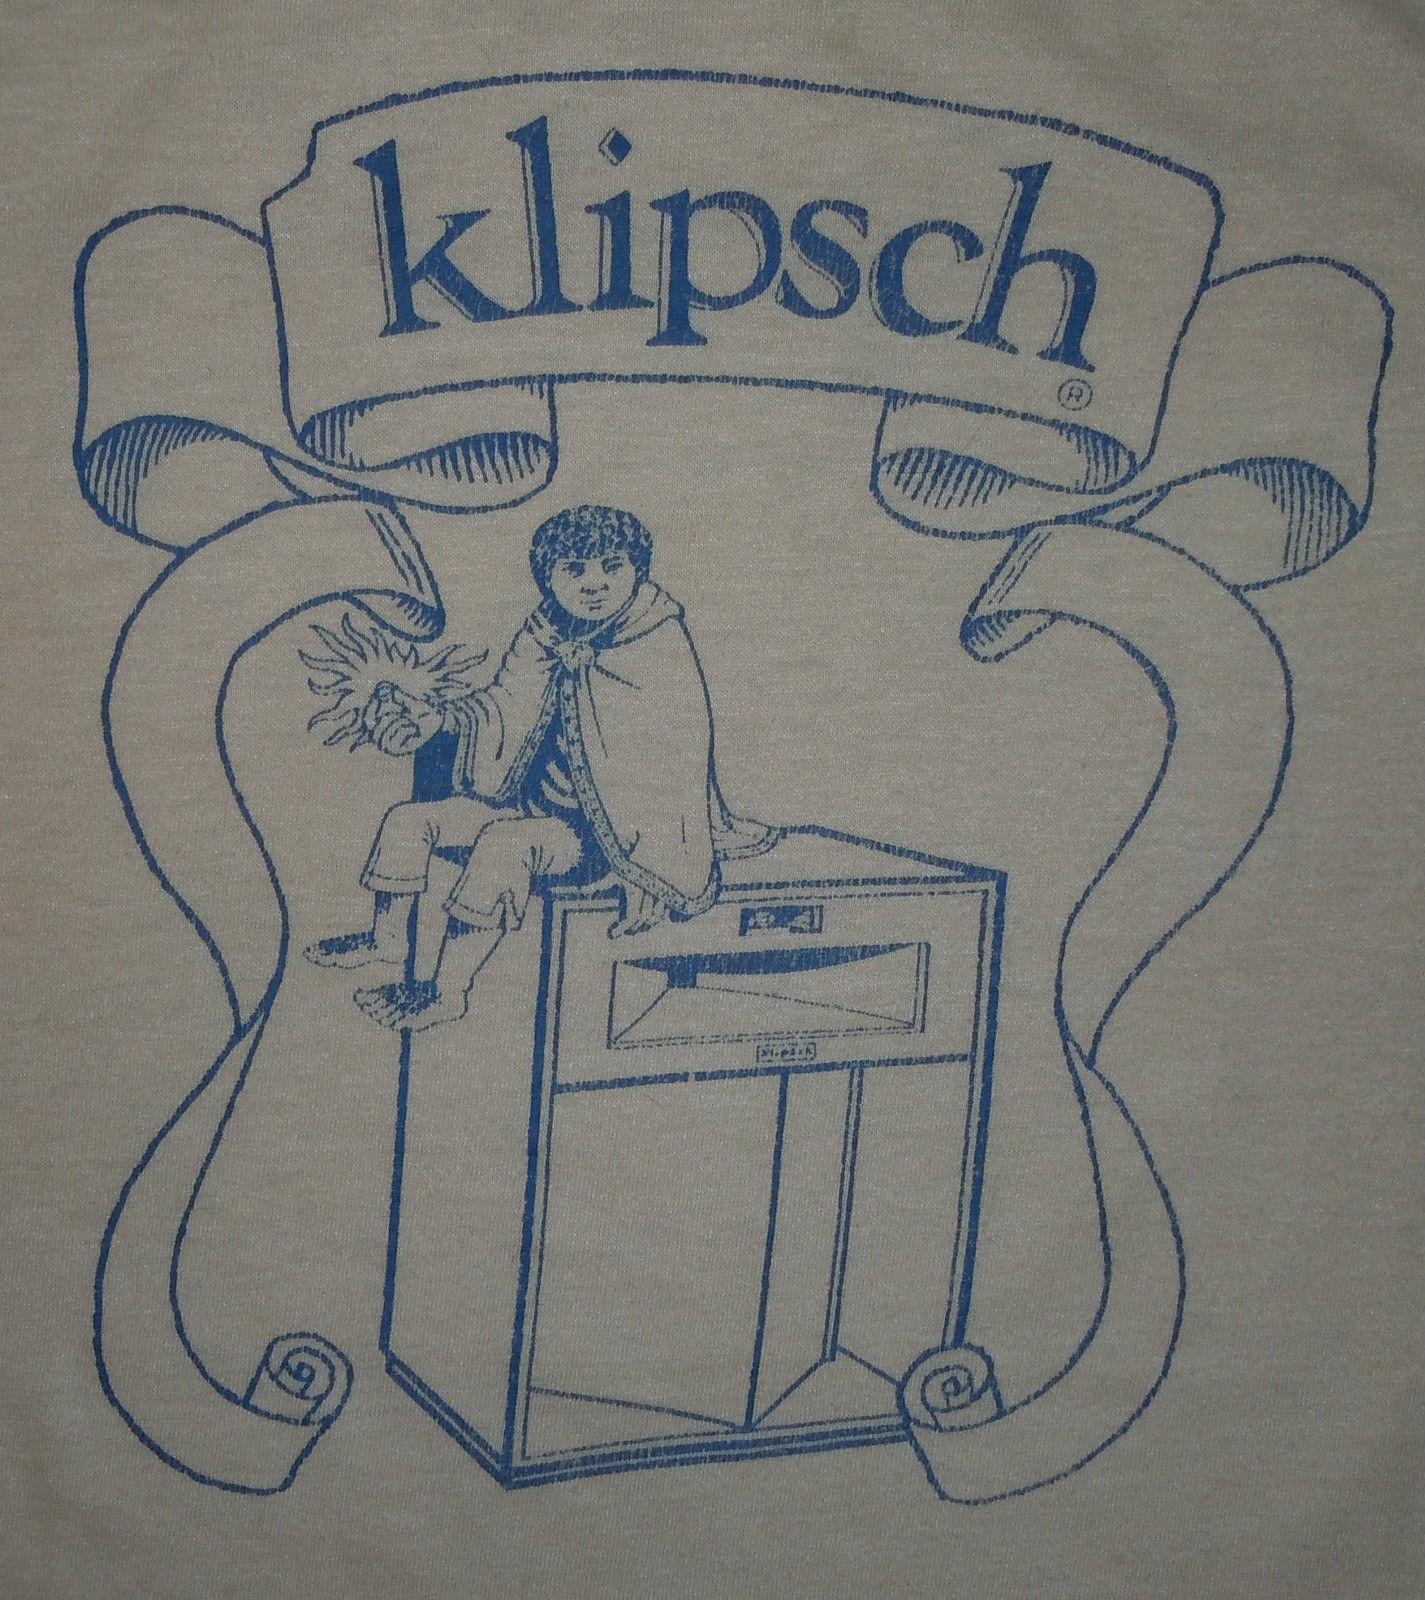 lotr-klipsch-1978.jpg